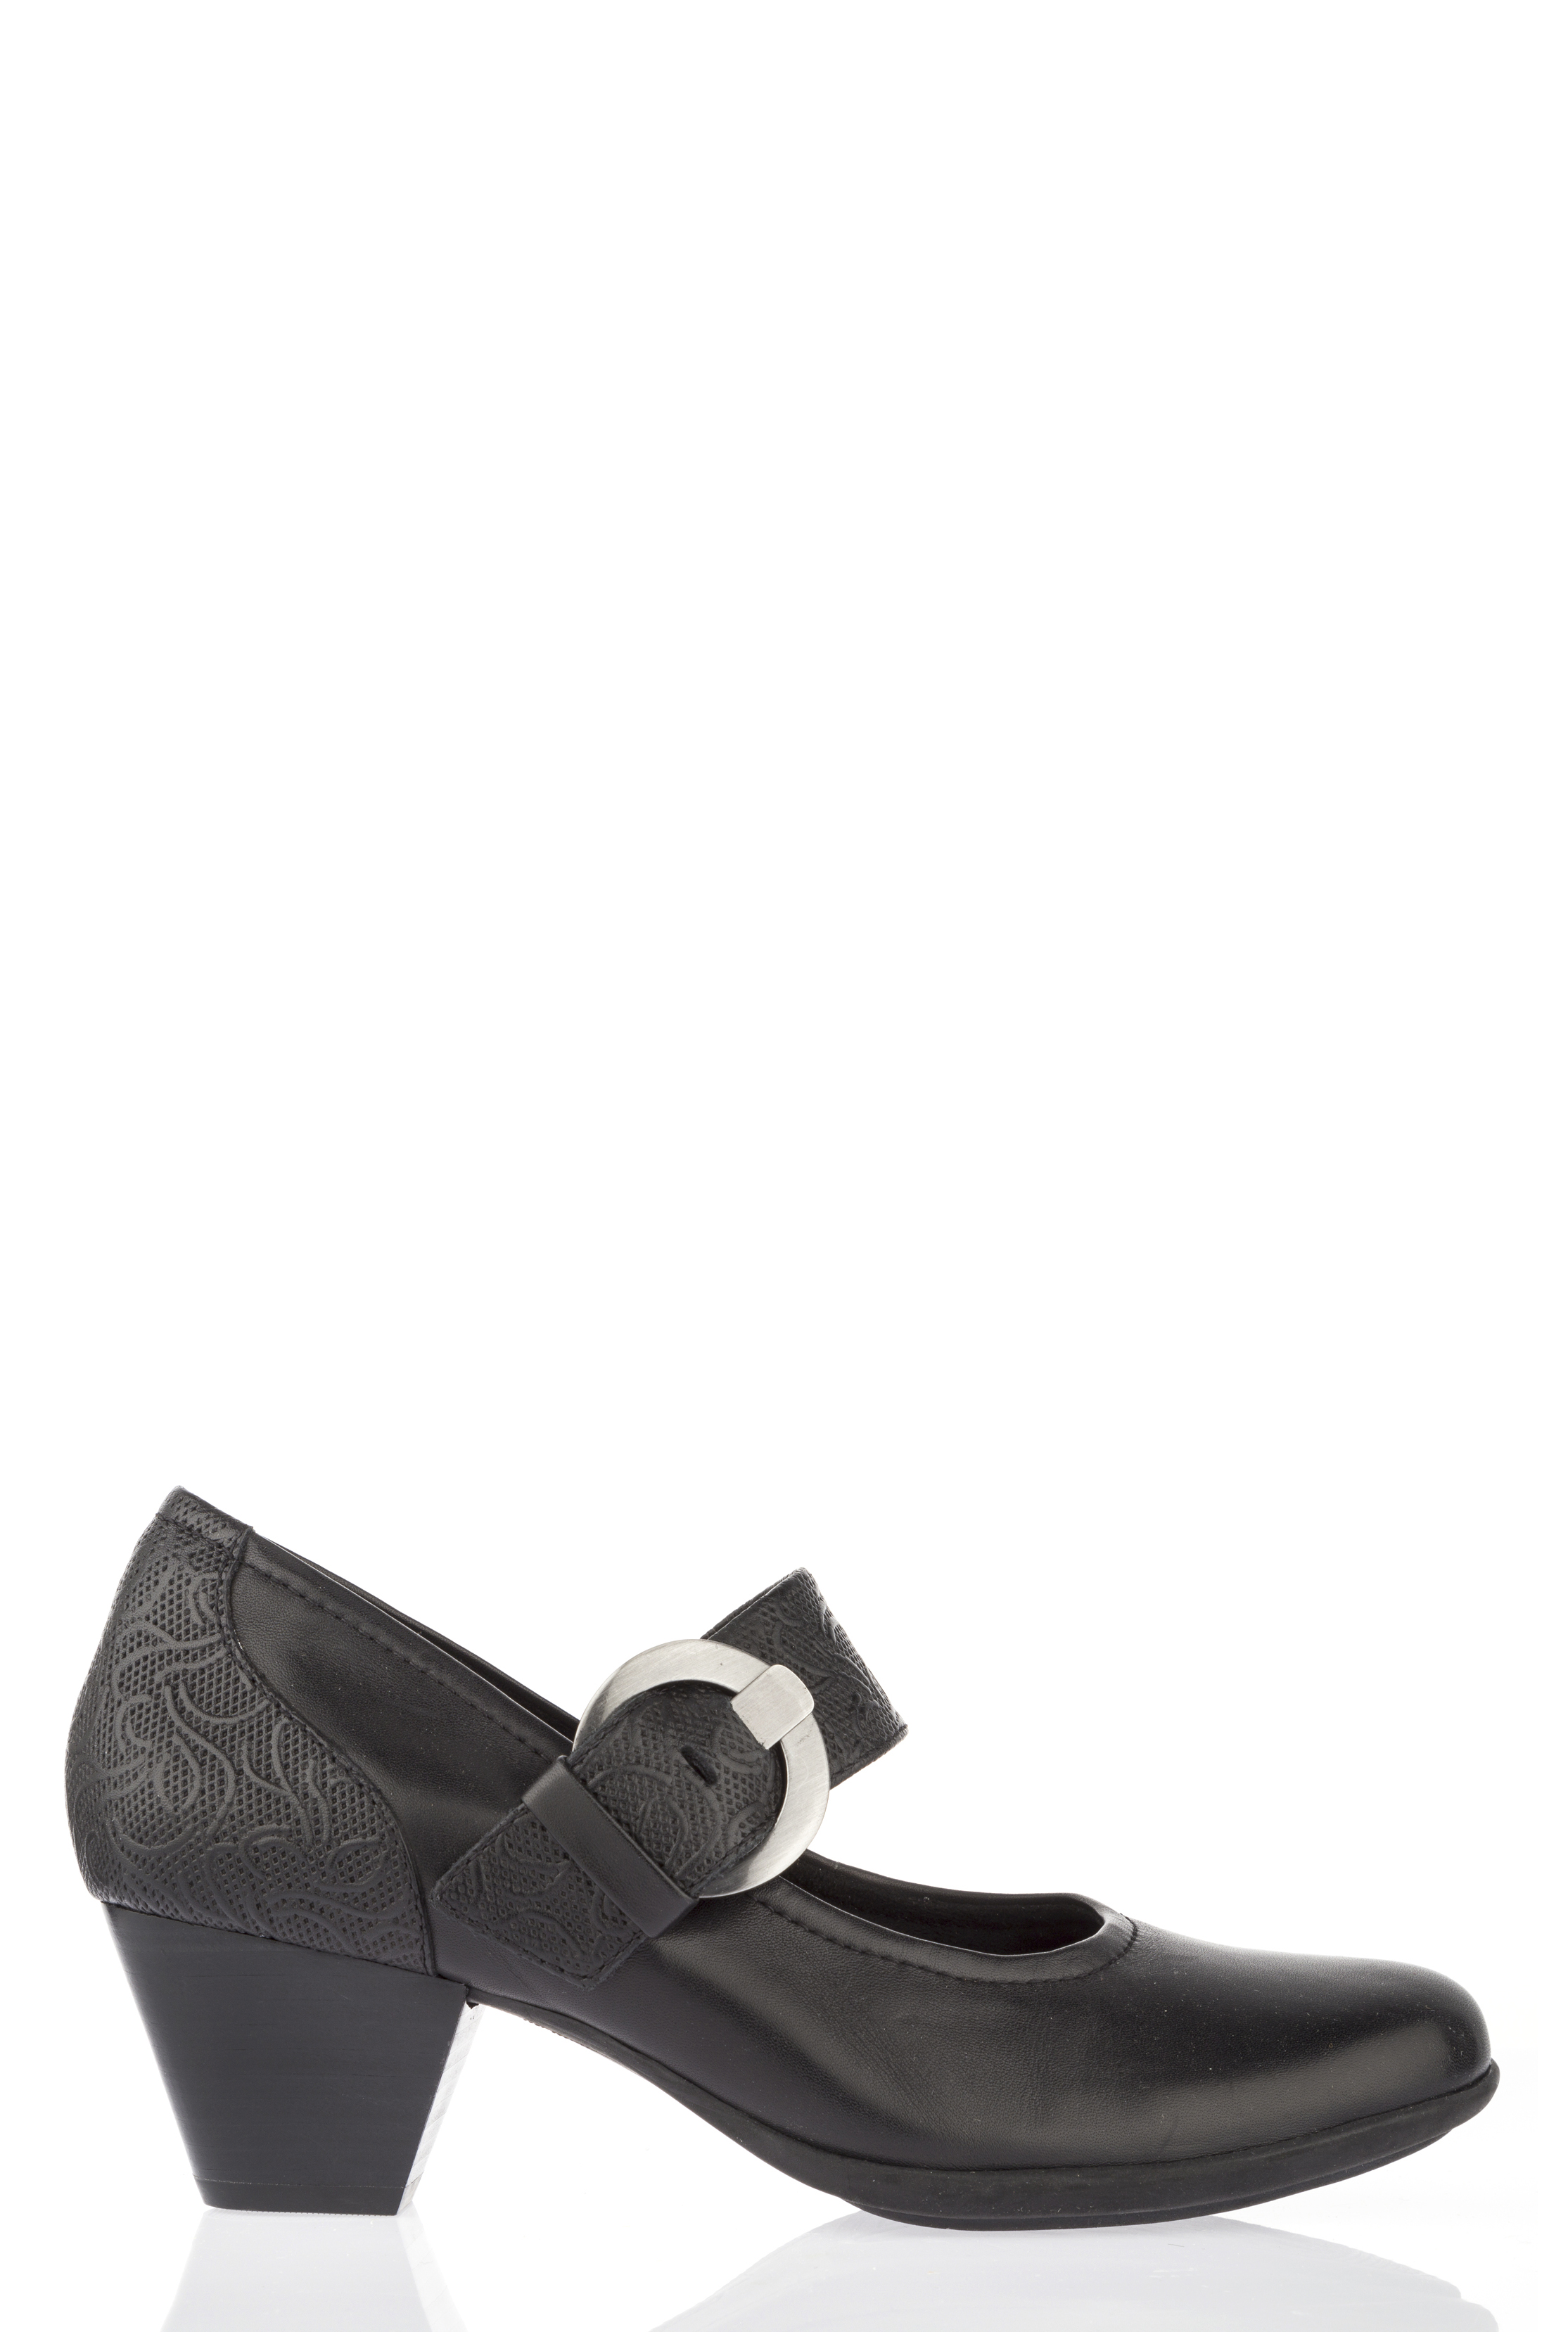 Black Earth Noble Heel Shoes_1.jpg